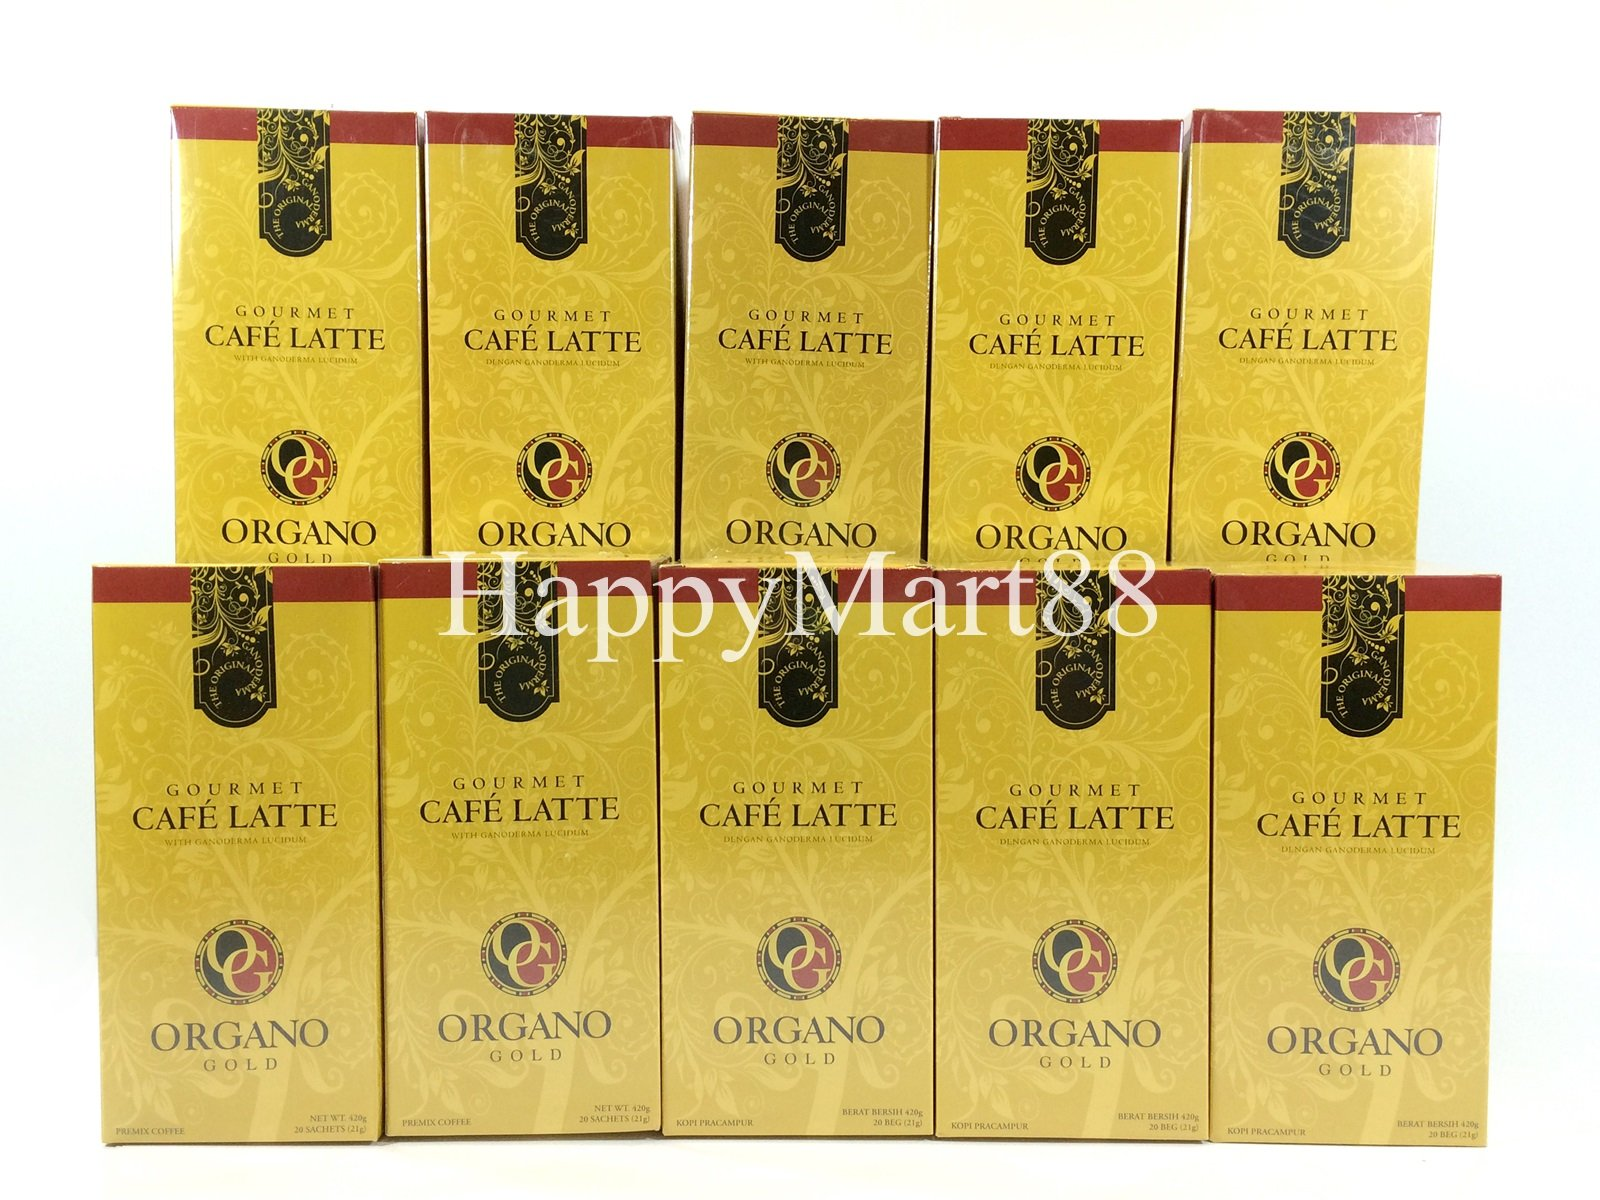 10 Boxes Organo Gold Gourmet Cafe Latte Ganoderma Lucidum + FREE 10 Sachets Gano Excel 3 in 1